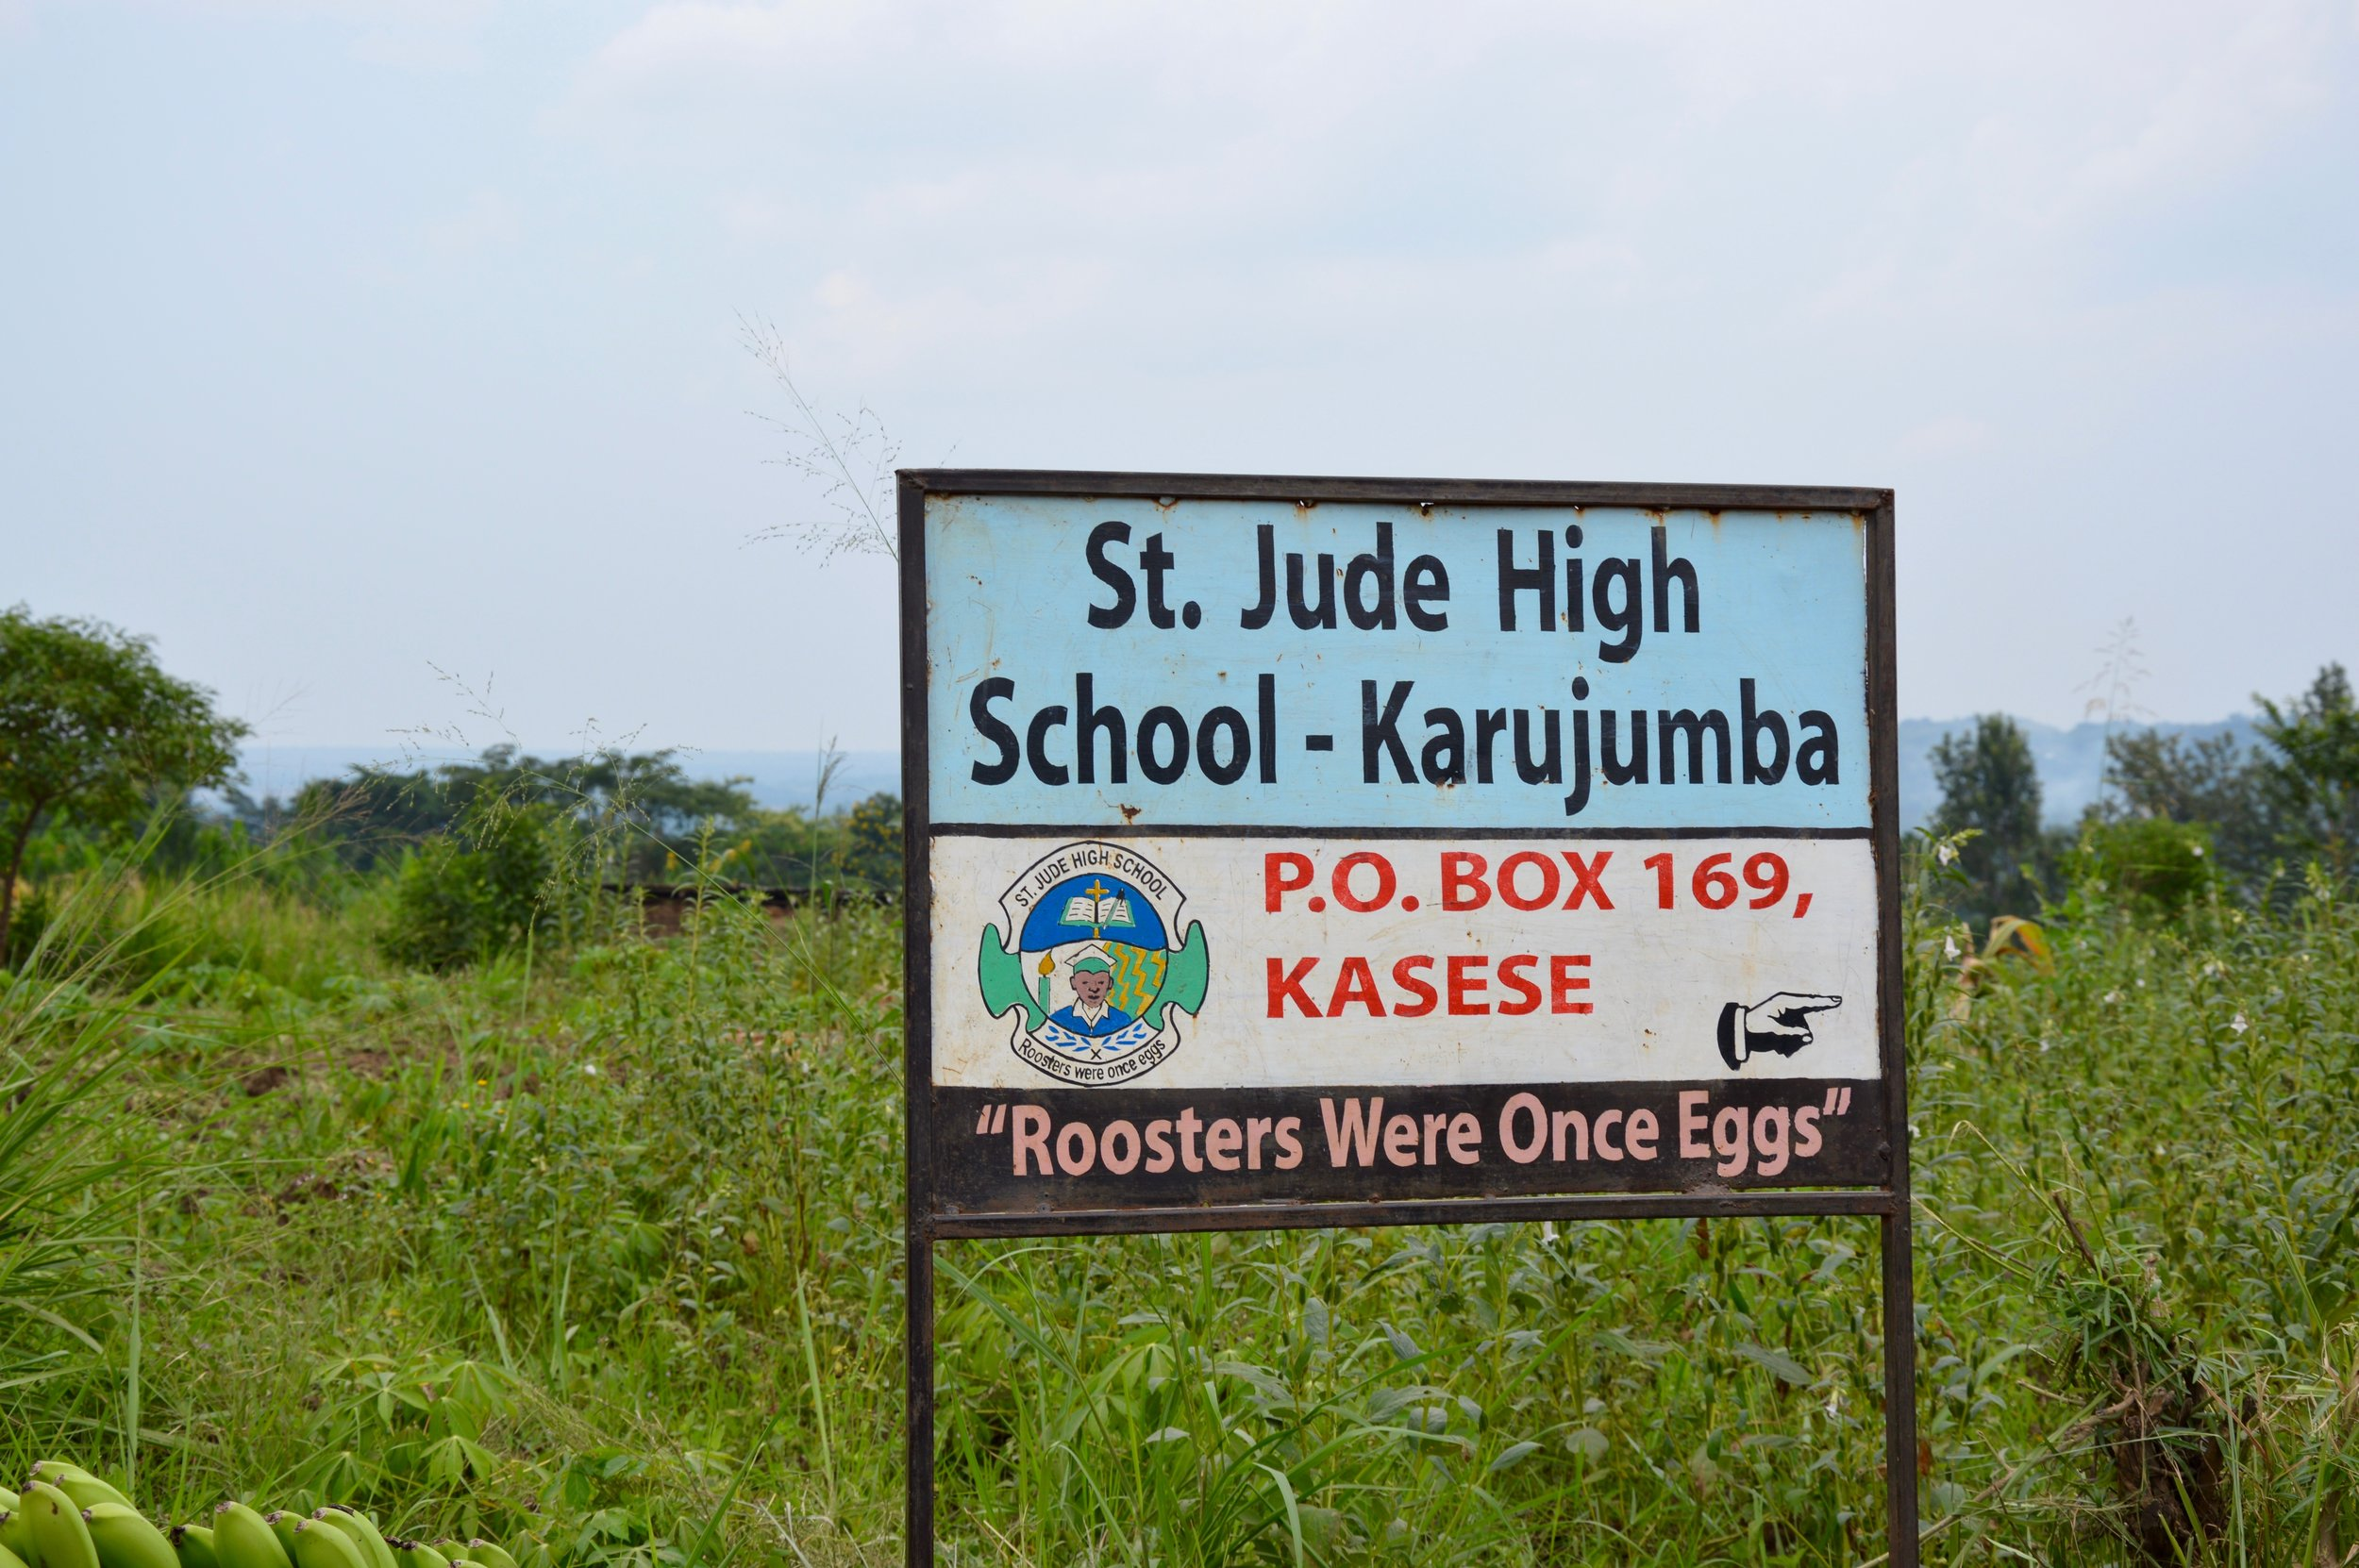 1 St. Jude High School (1).jpg